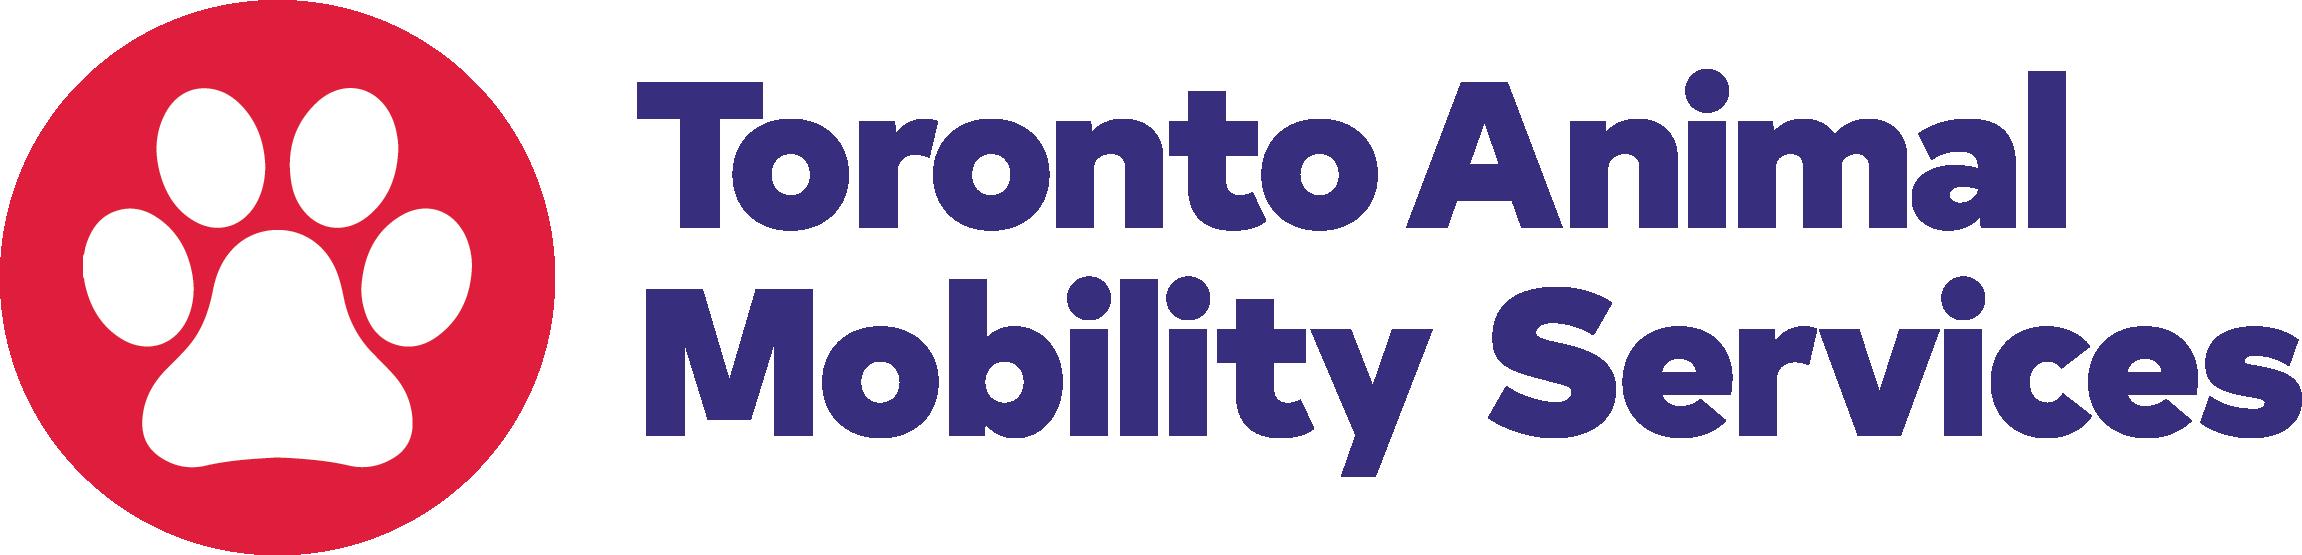 Toronto Animal Mobility Services